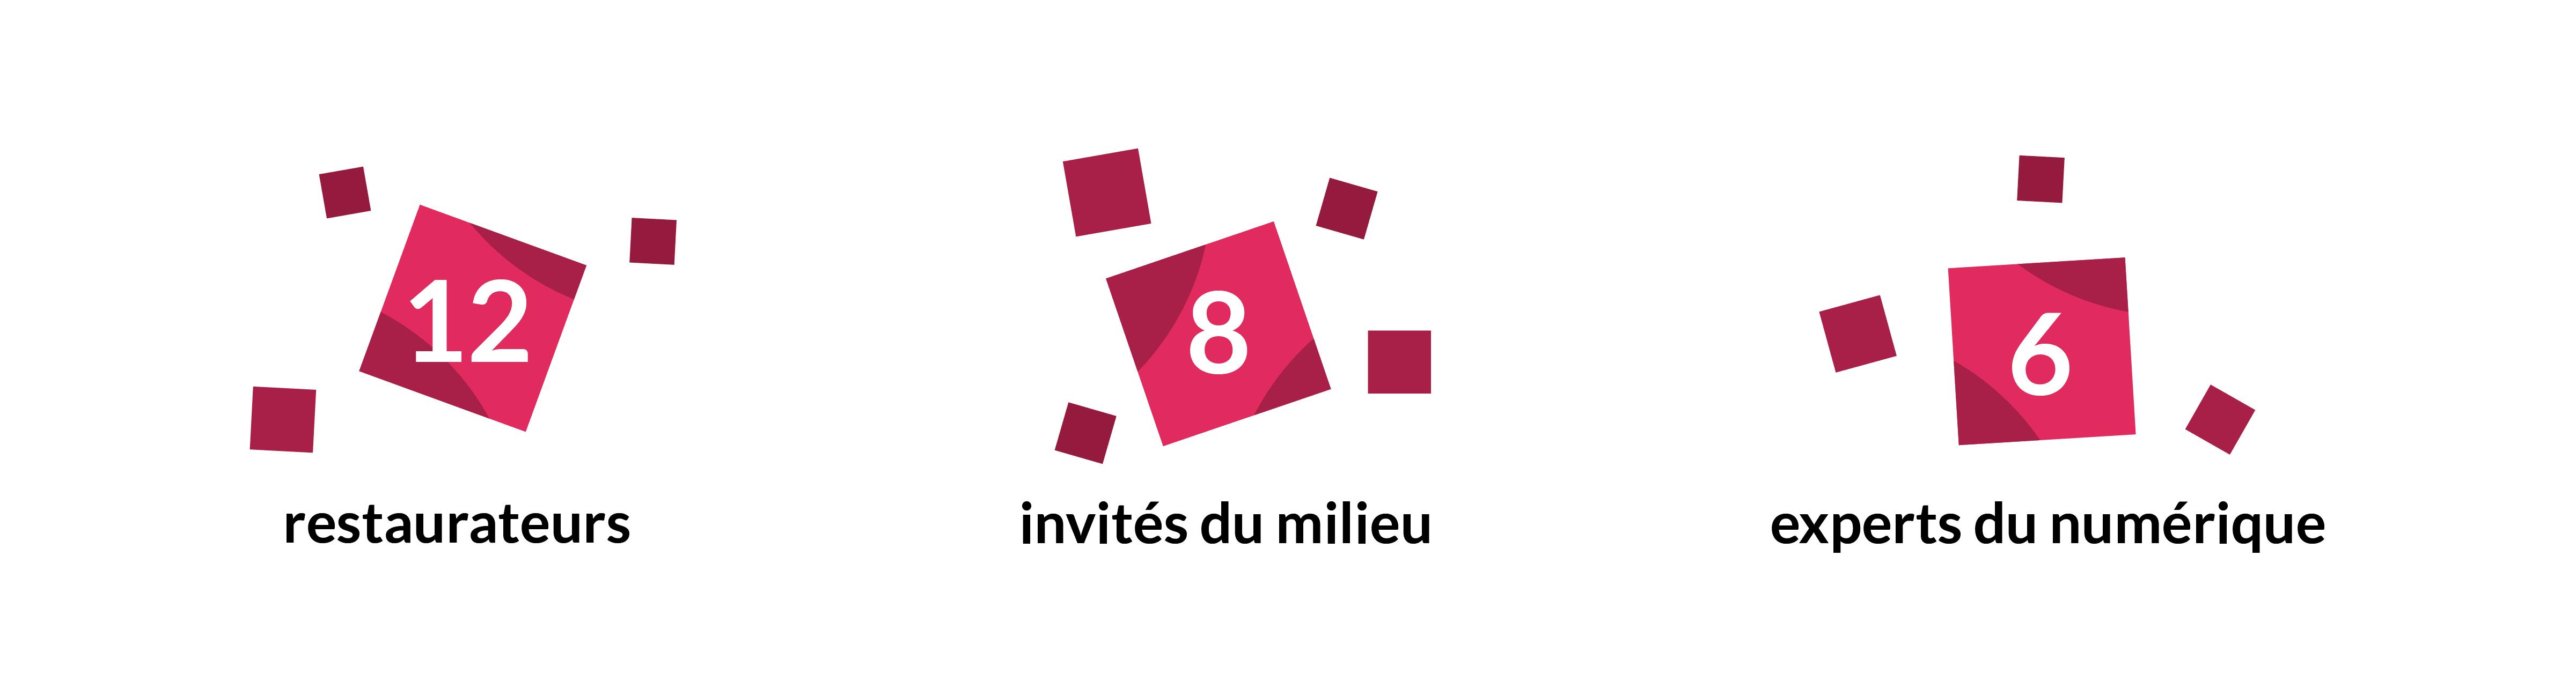 InfoEMS_Number